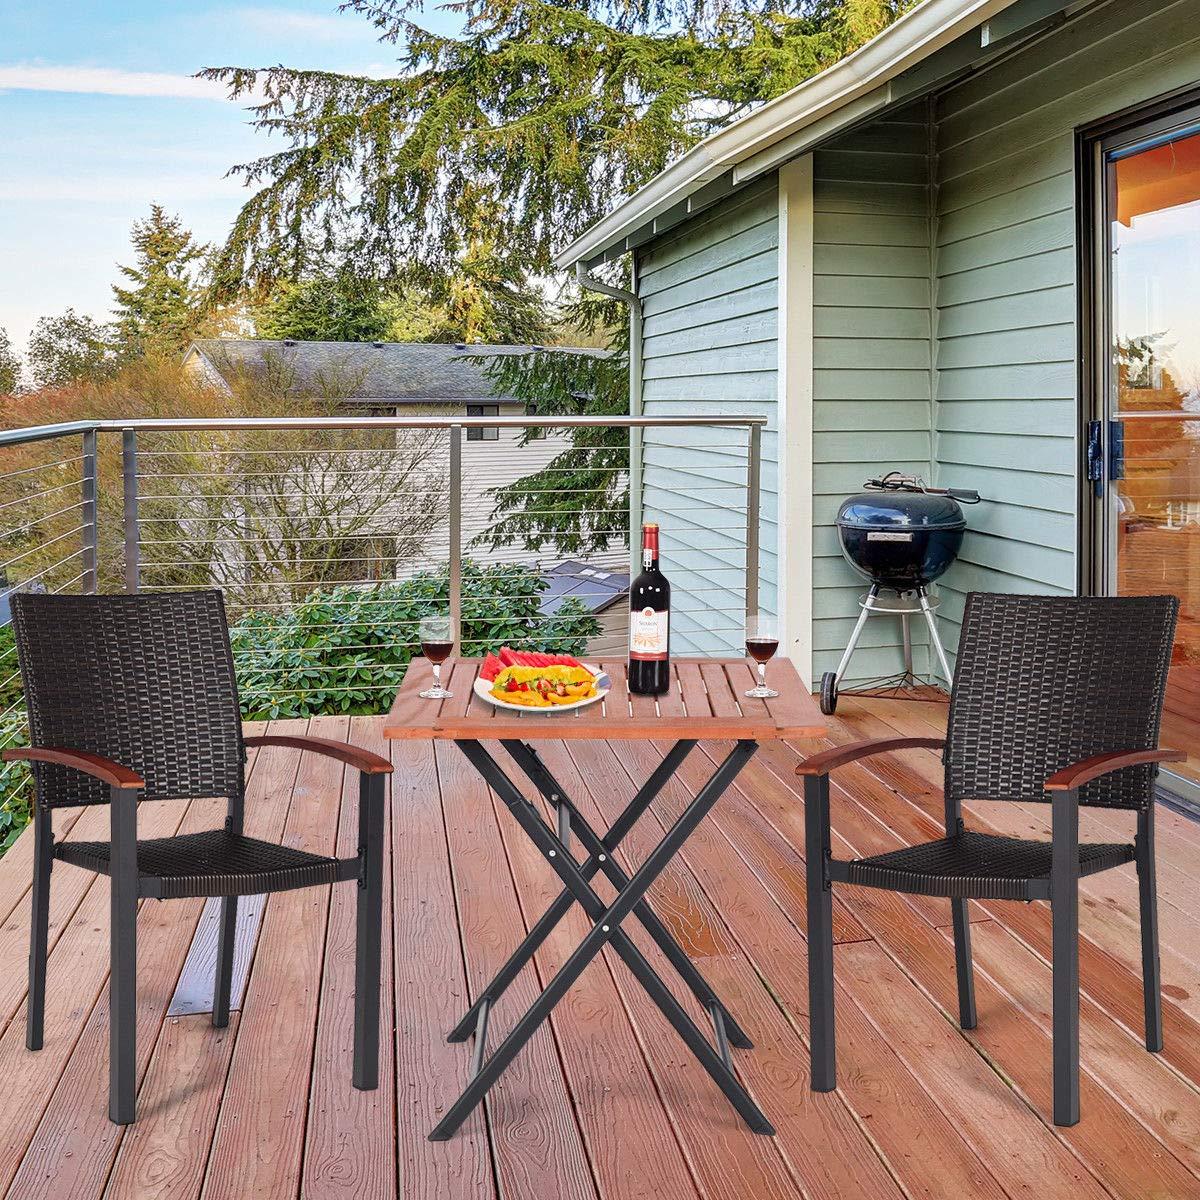 Amazon.com: Jur_Global - 2 sillas de comedor apilables de ...